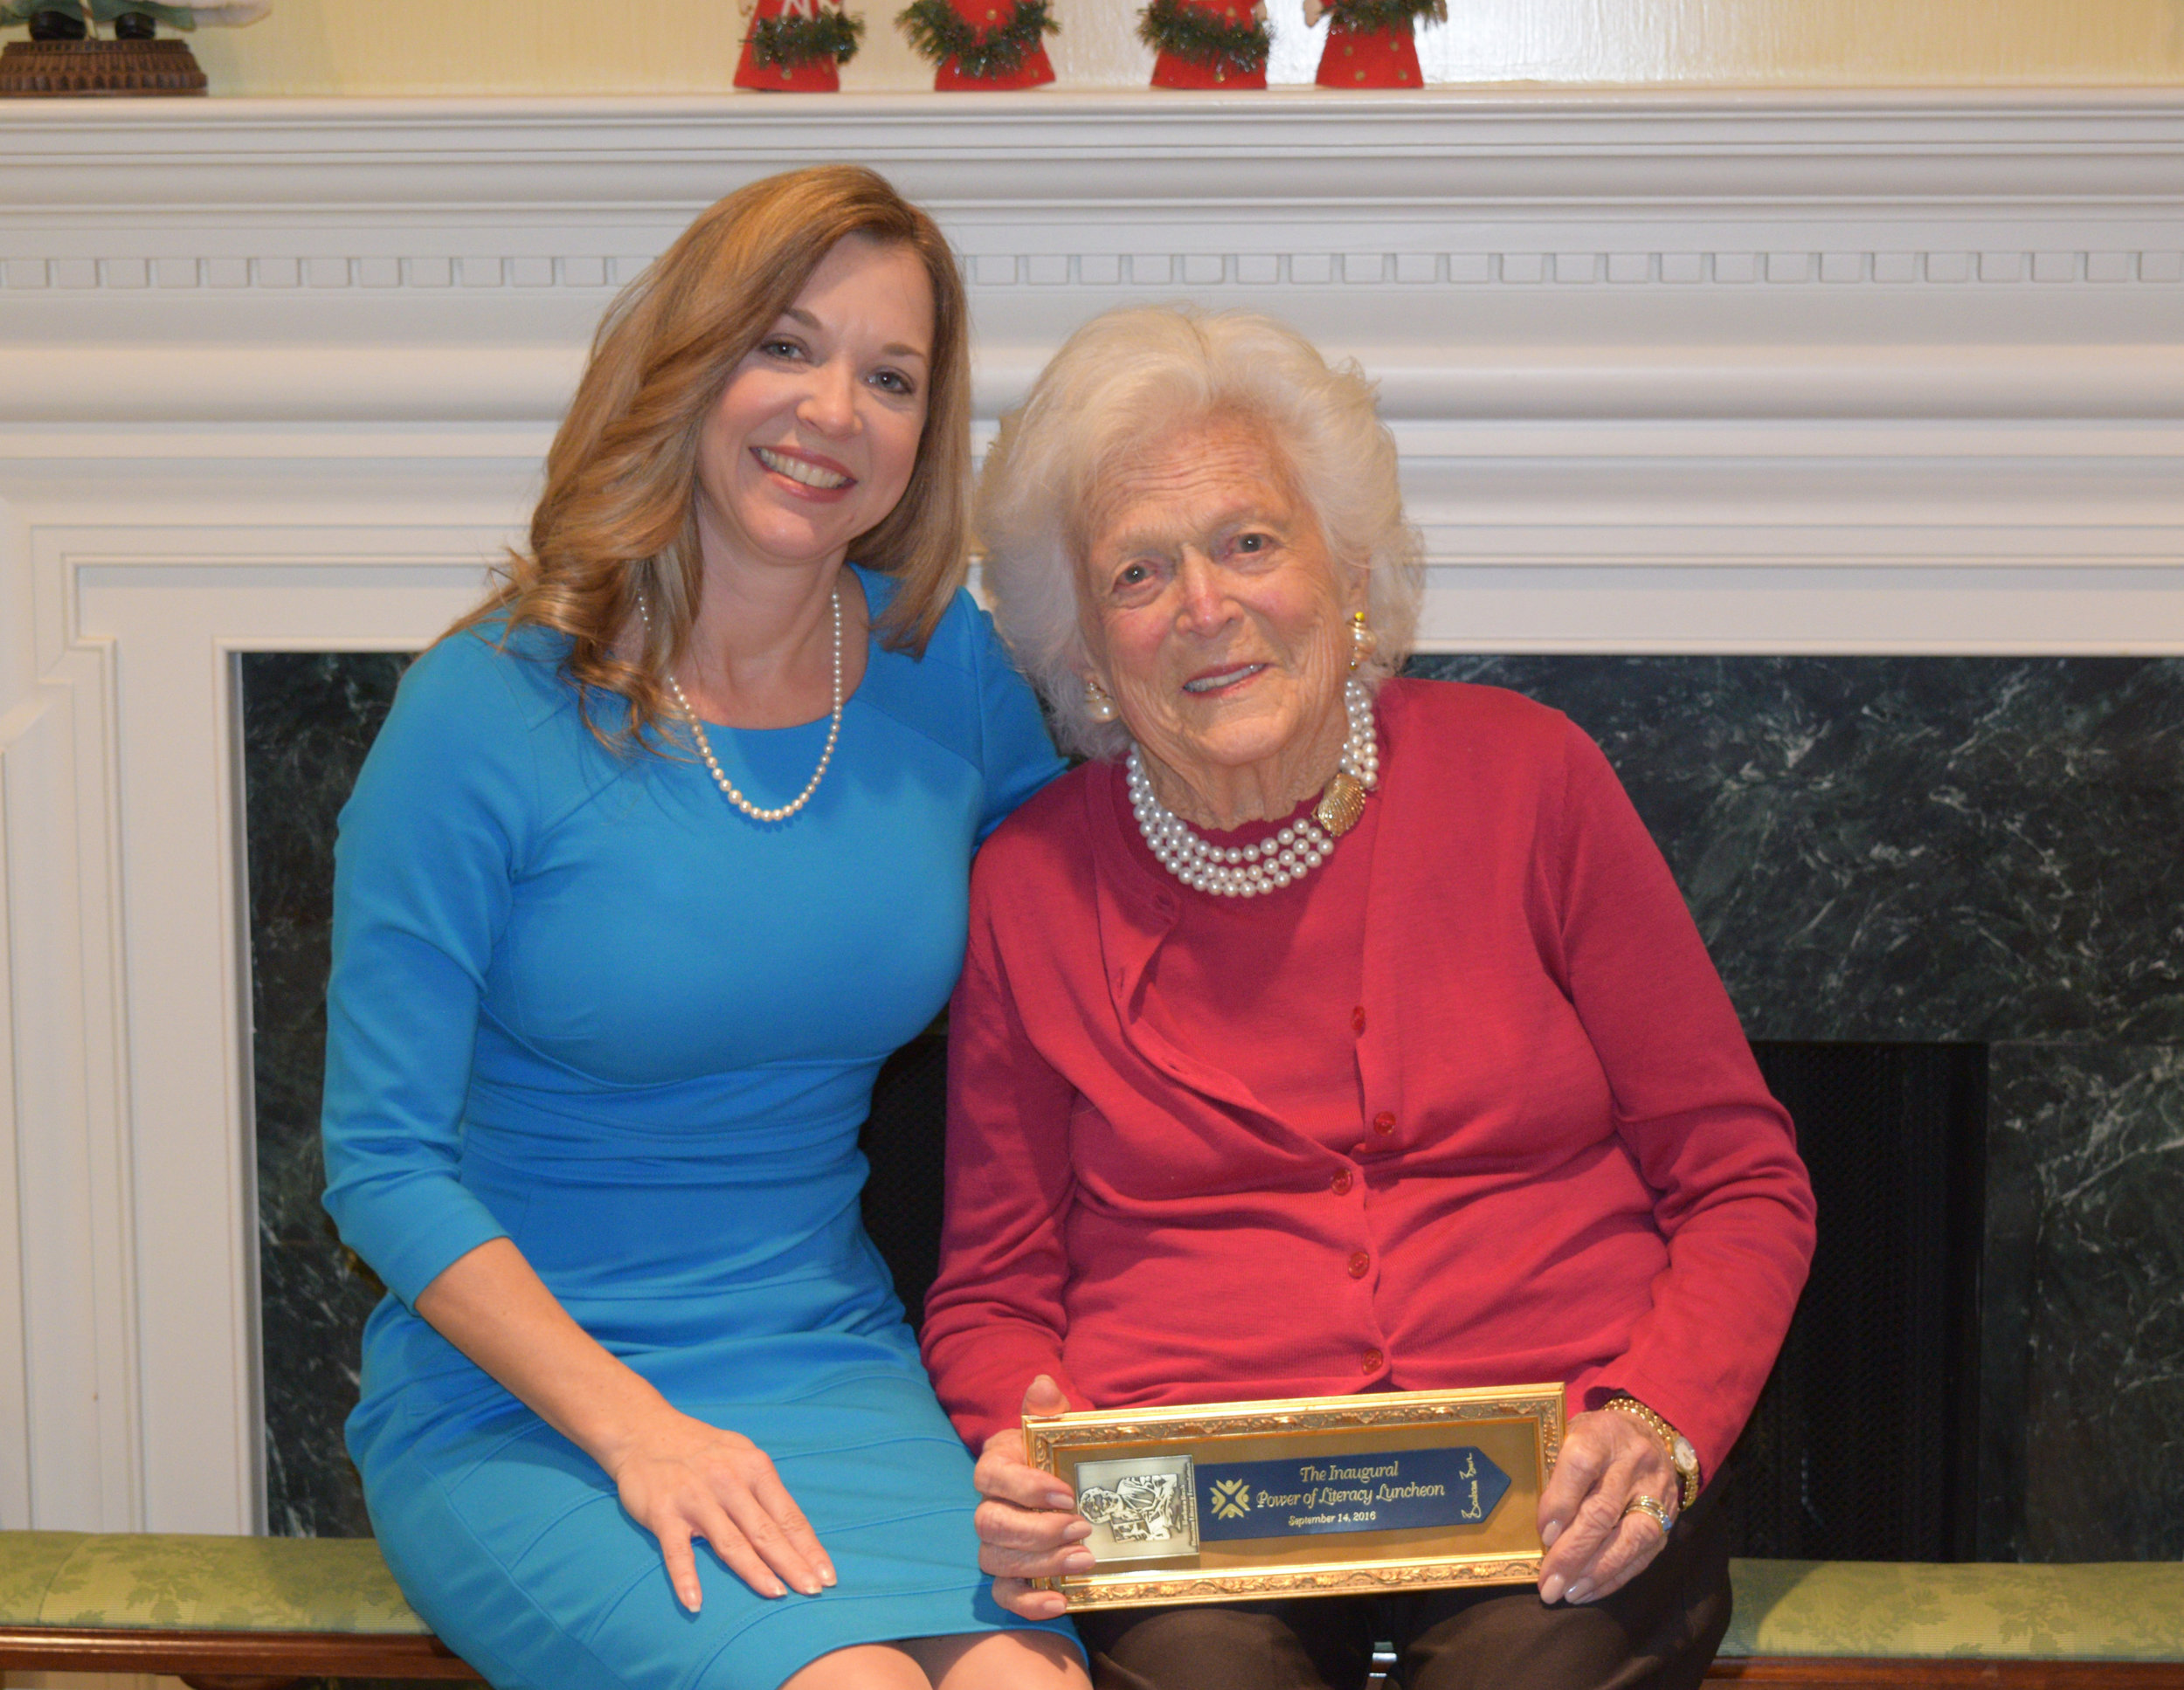 First Lady Barbara Bush with Foundation President Dr. Julie Baker Finck